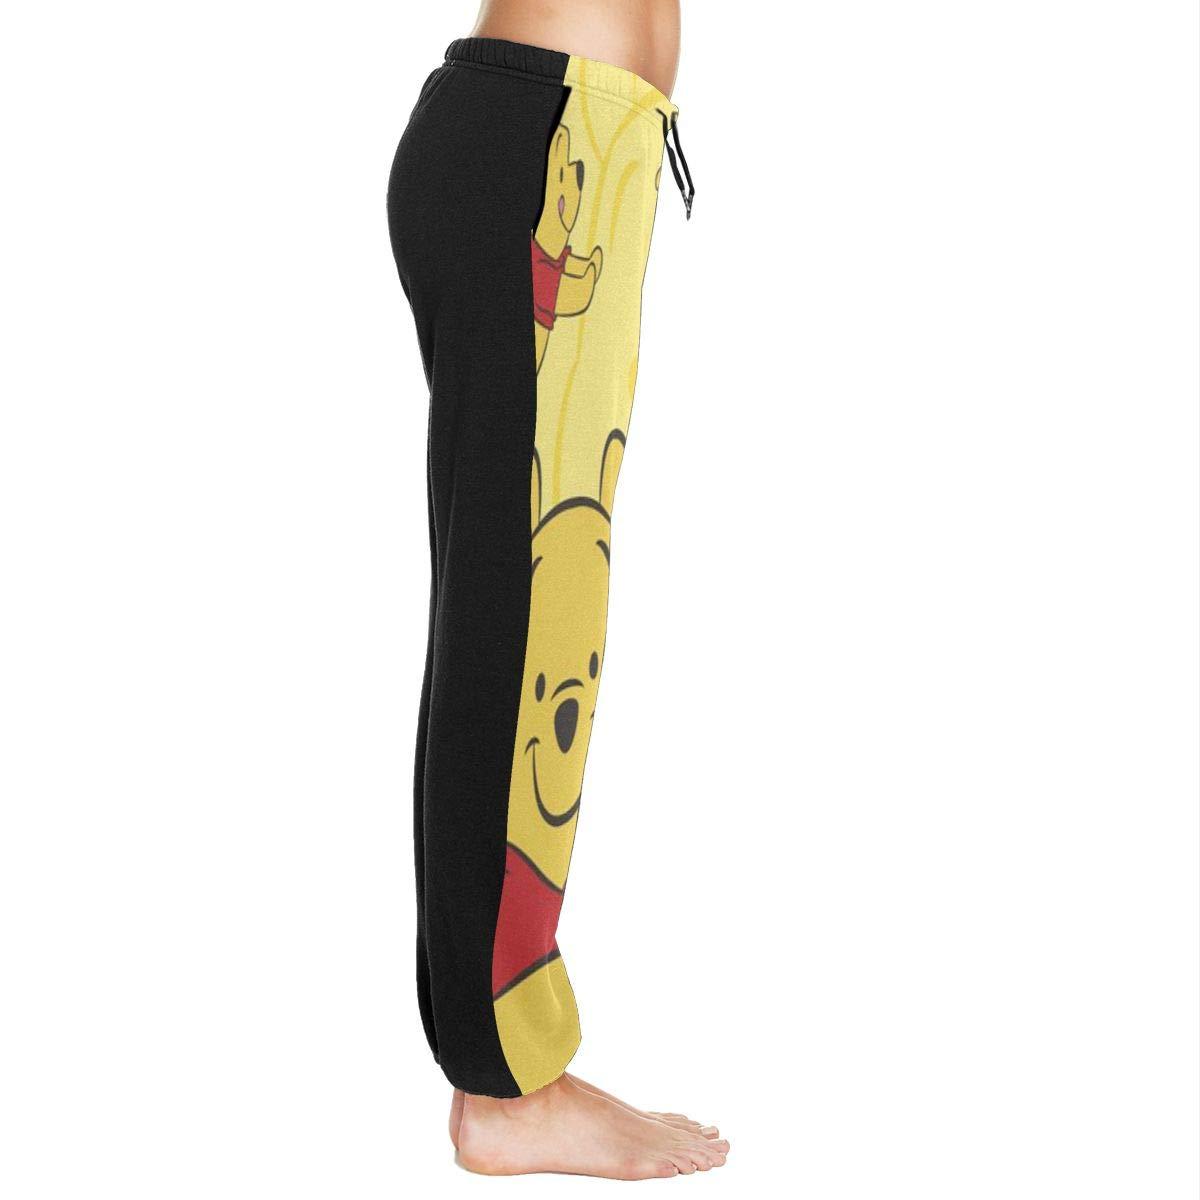 Xzcxyadd Womens Jogger Lounge Sleep Sweatpants Pajamas Pants Winnie Pooh Print Drawstring Lounge Pants /ï/¼/ˆS-XXL/ï/¼/‰